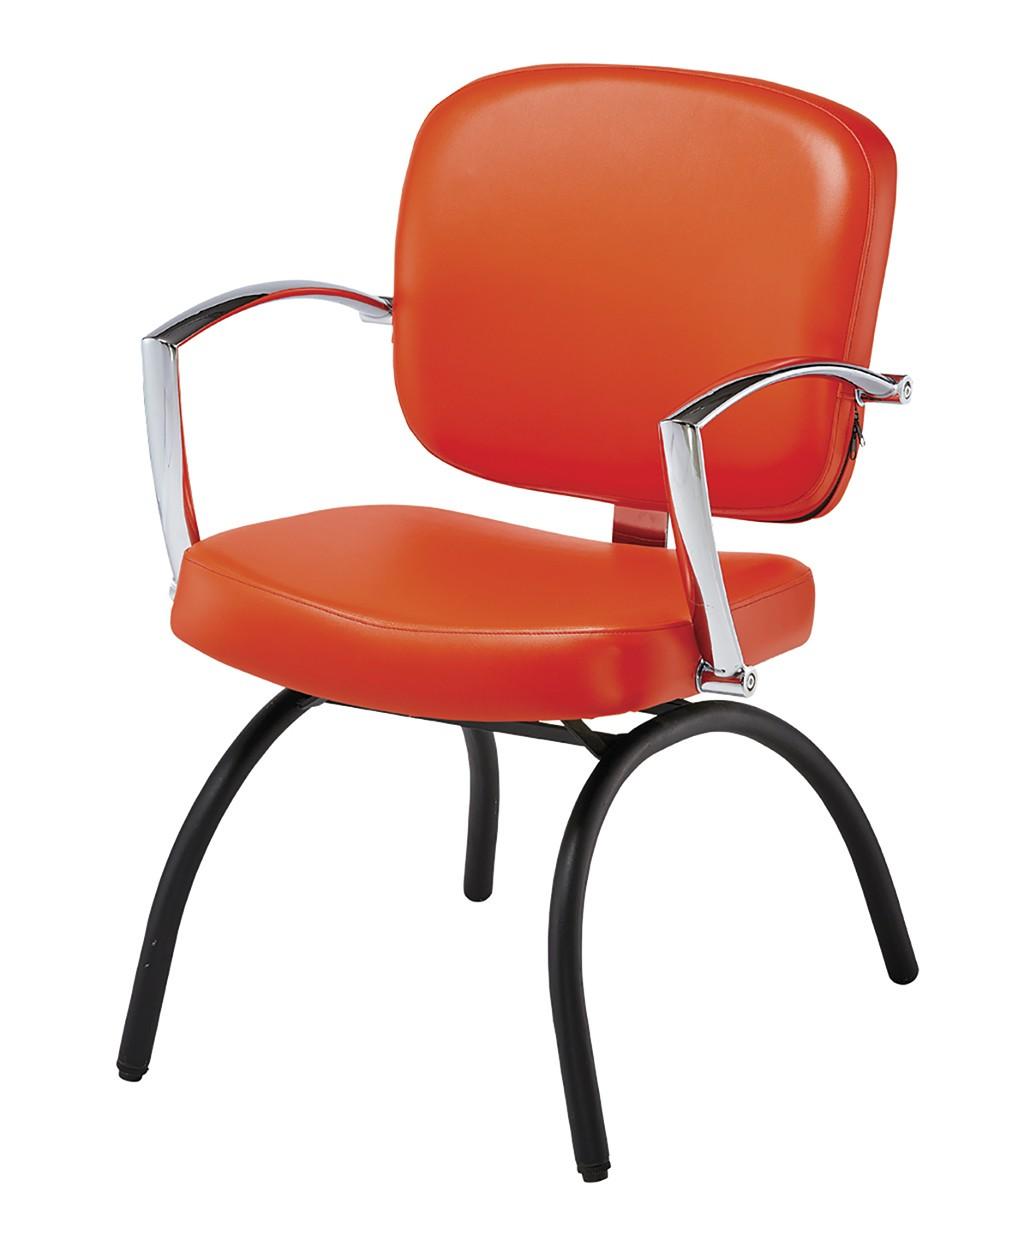 Pibbs 3720 Pisa Reception Chair